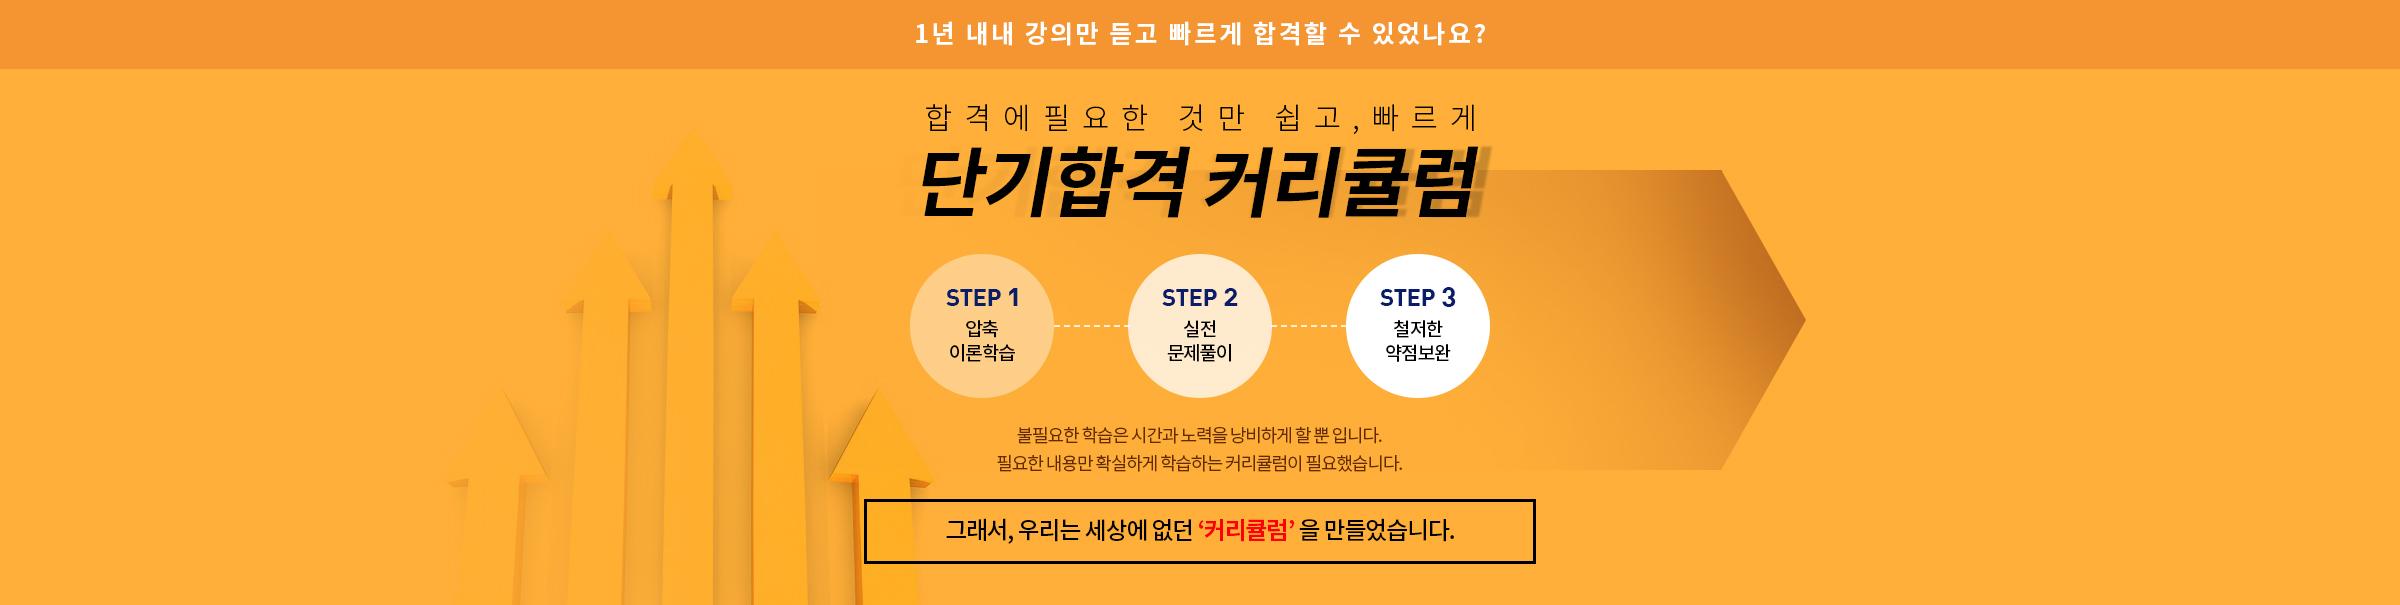 New 휴넷PASS_main_비주얼배너